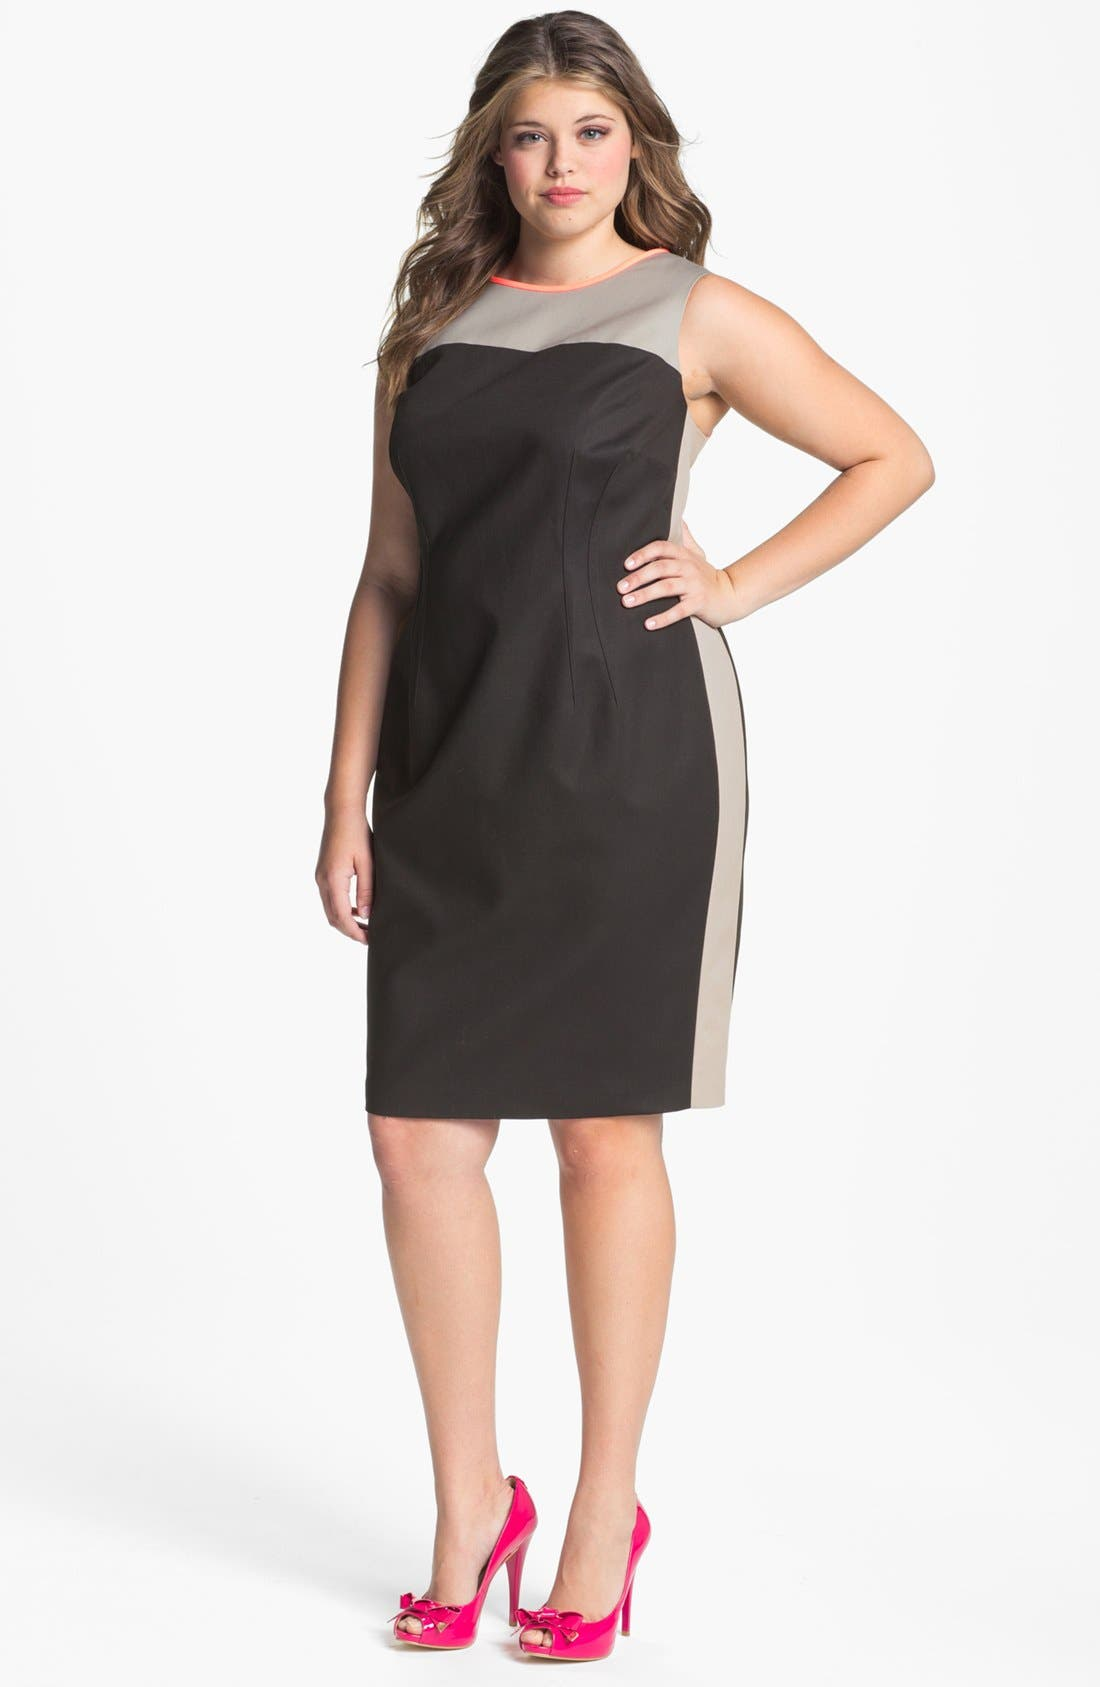 Alternate Image 1 Selected - Tahari Woman 'Dakota' Colorblock Sheath Dress (Plus Size)